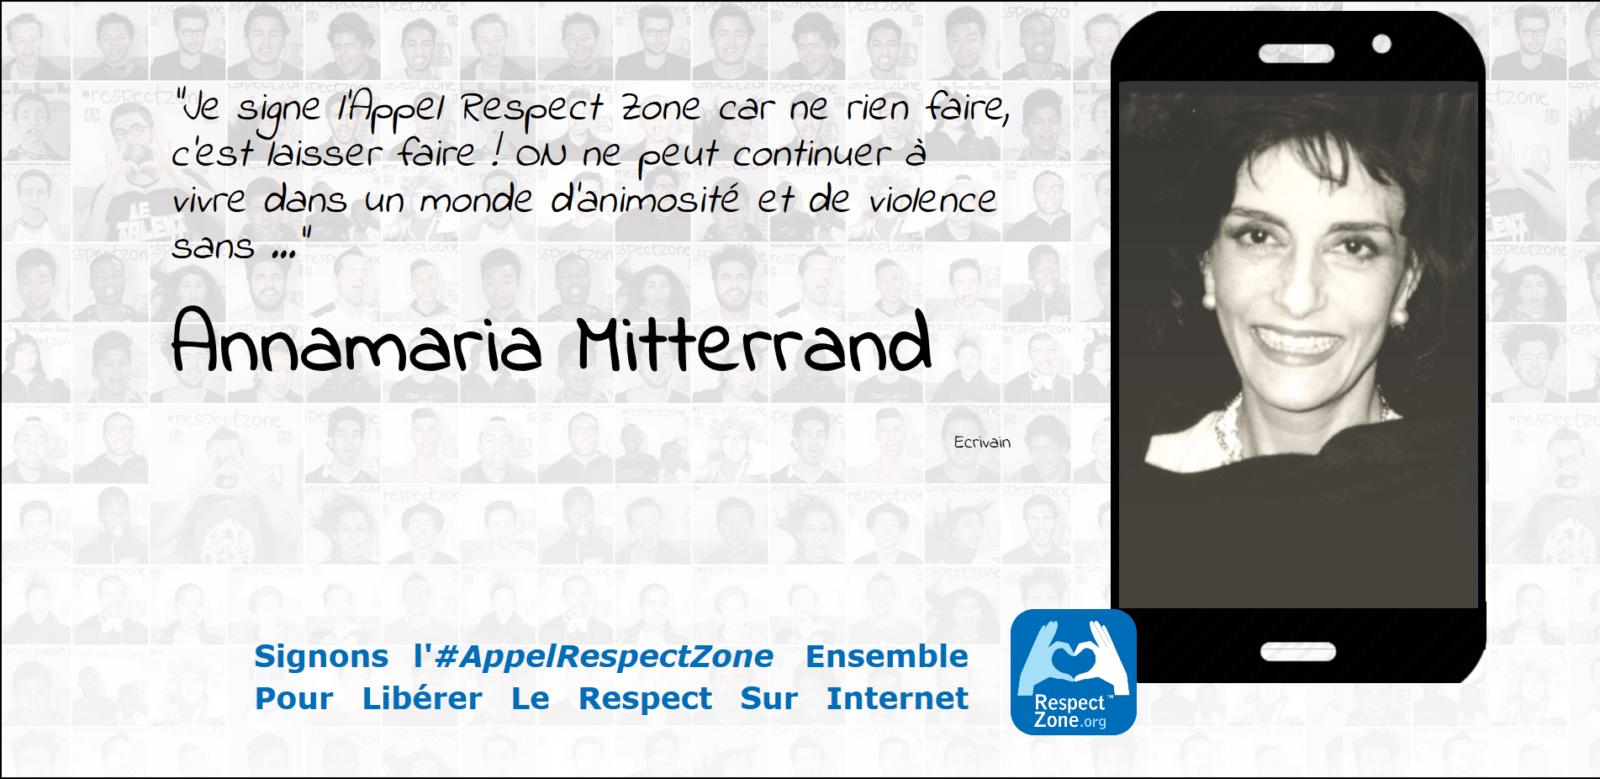 Annamaria Mitterrand